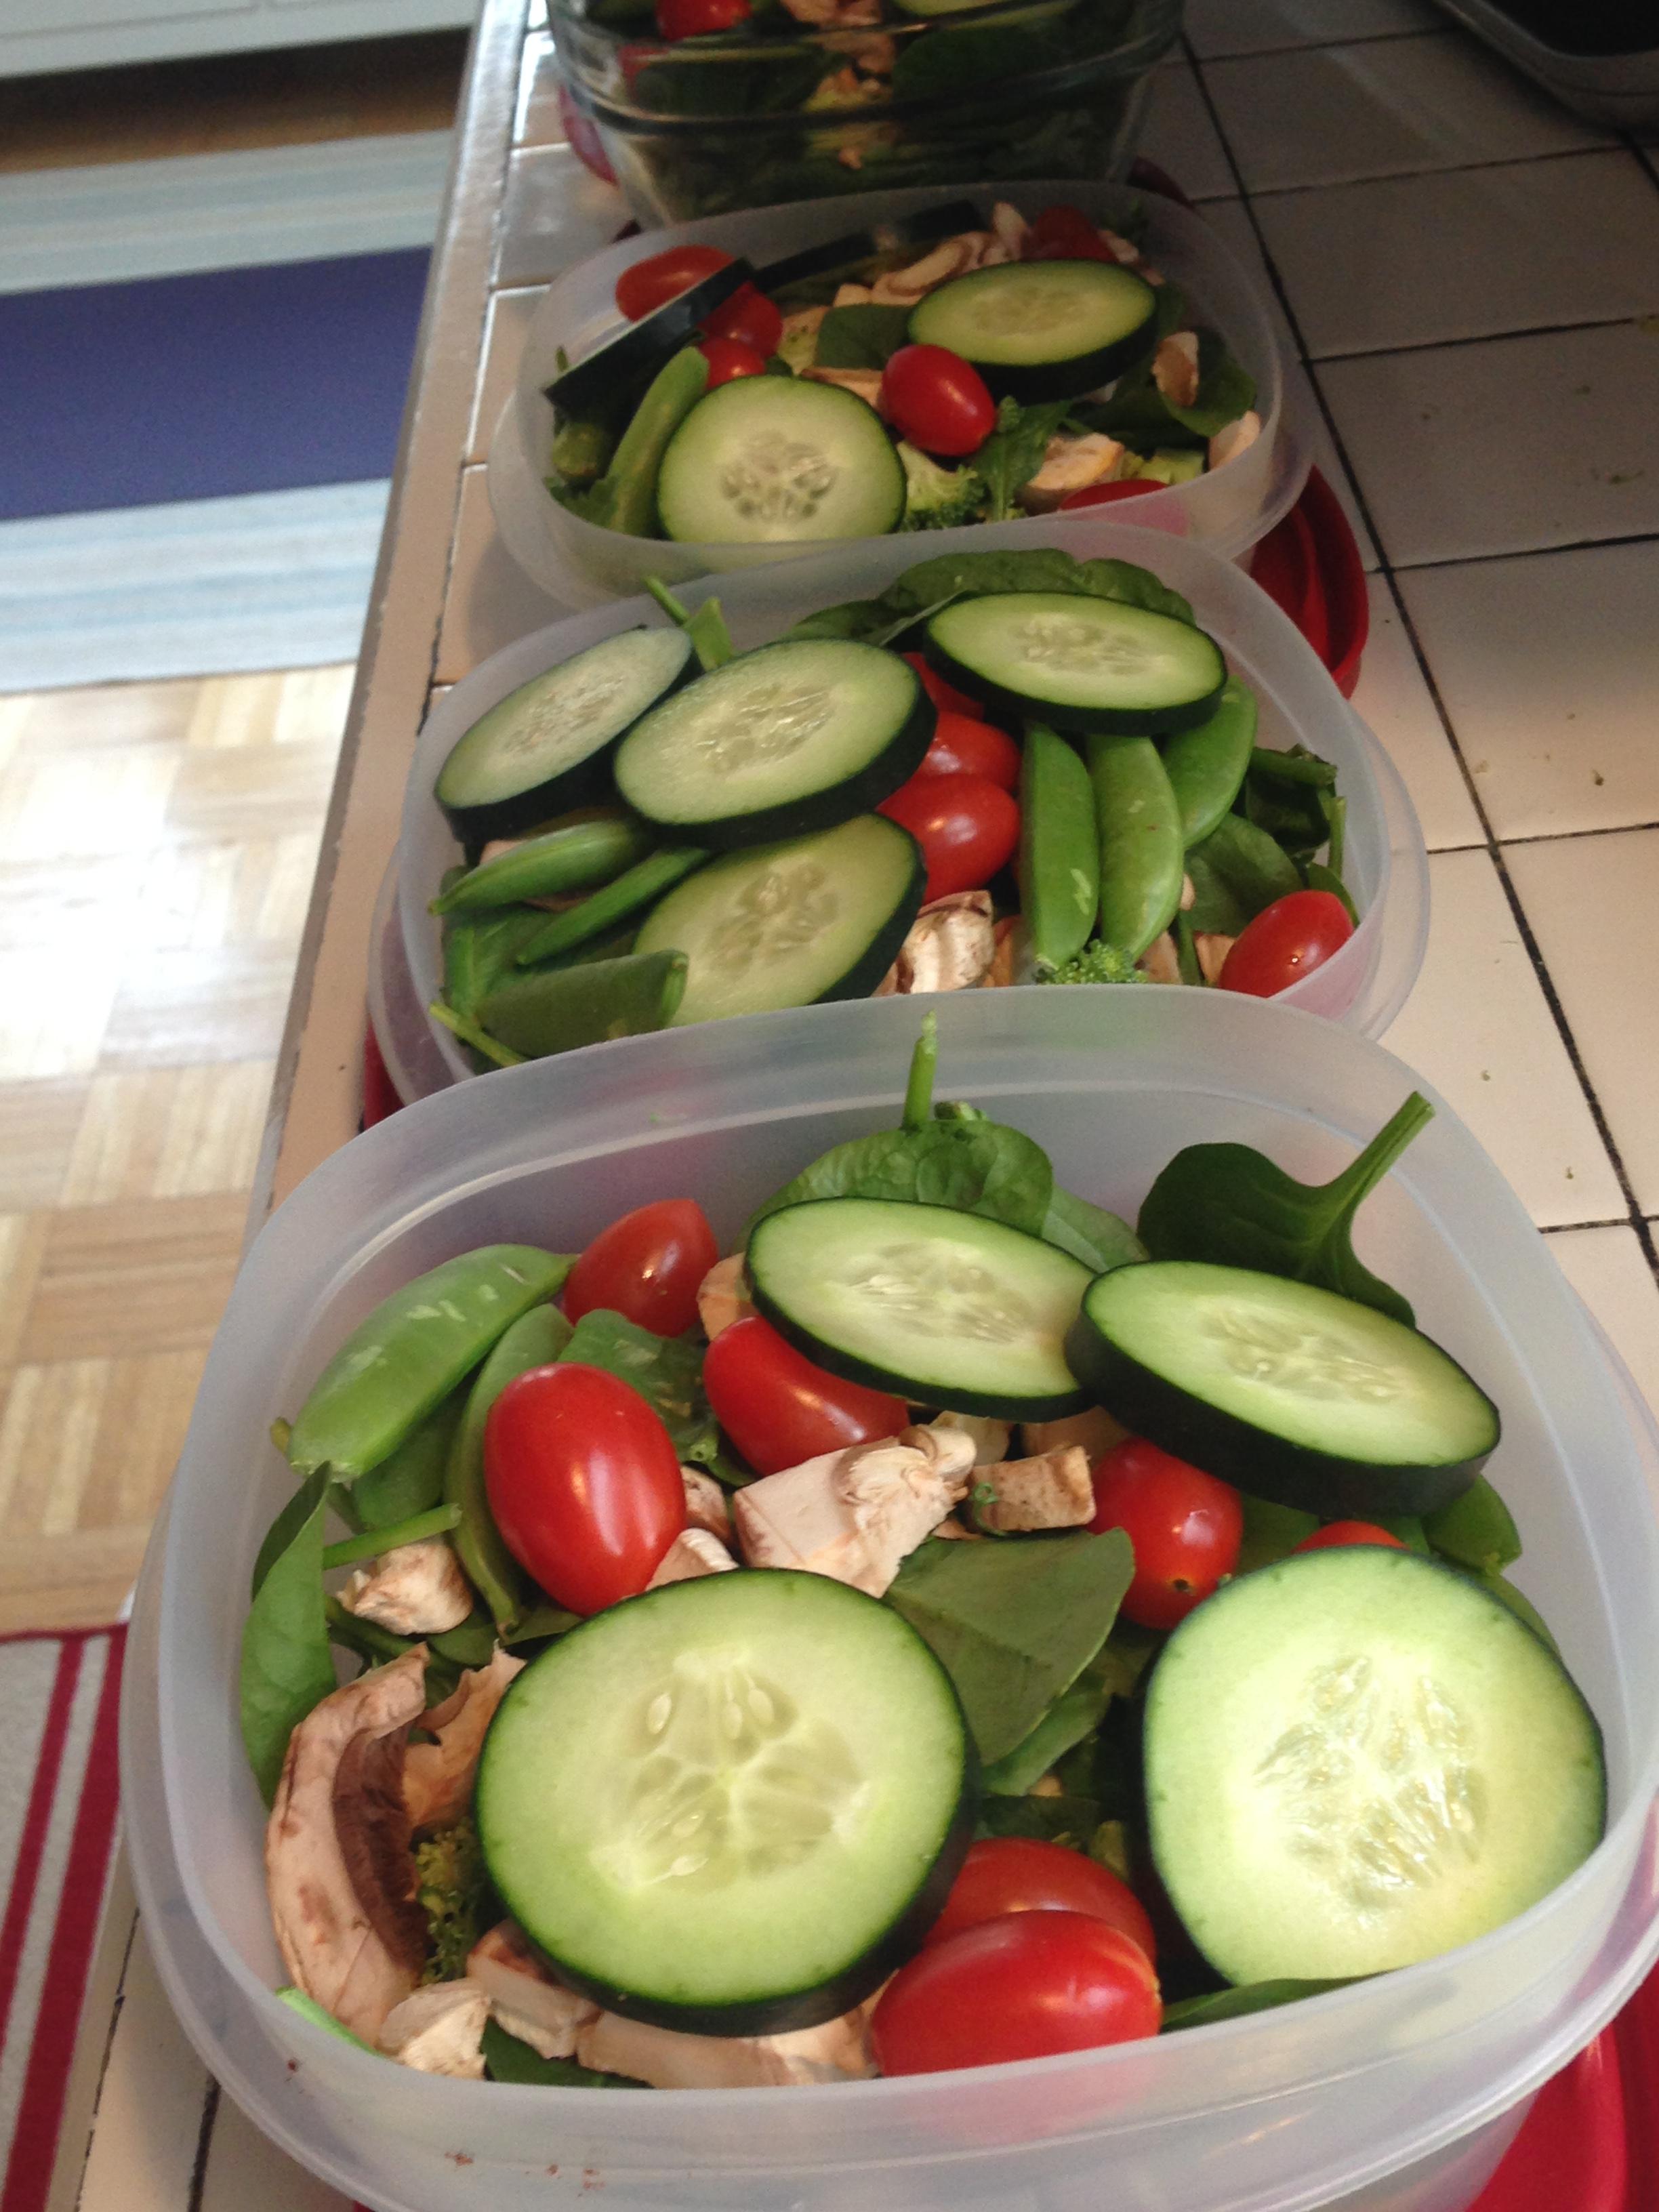 saladassembly